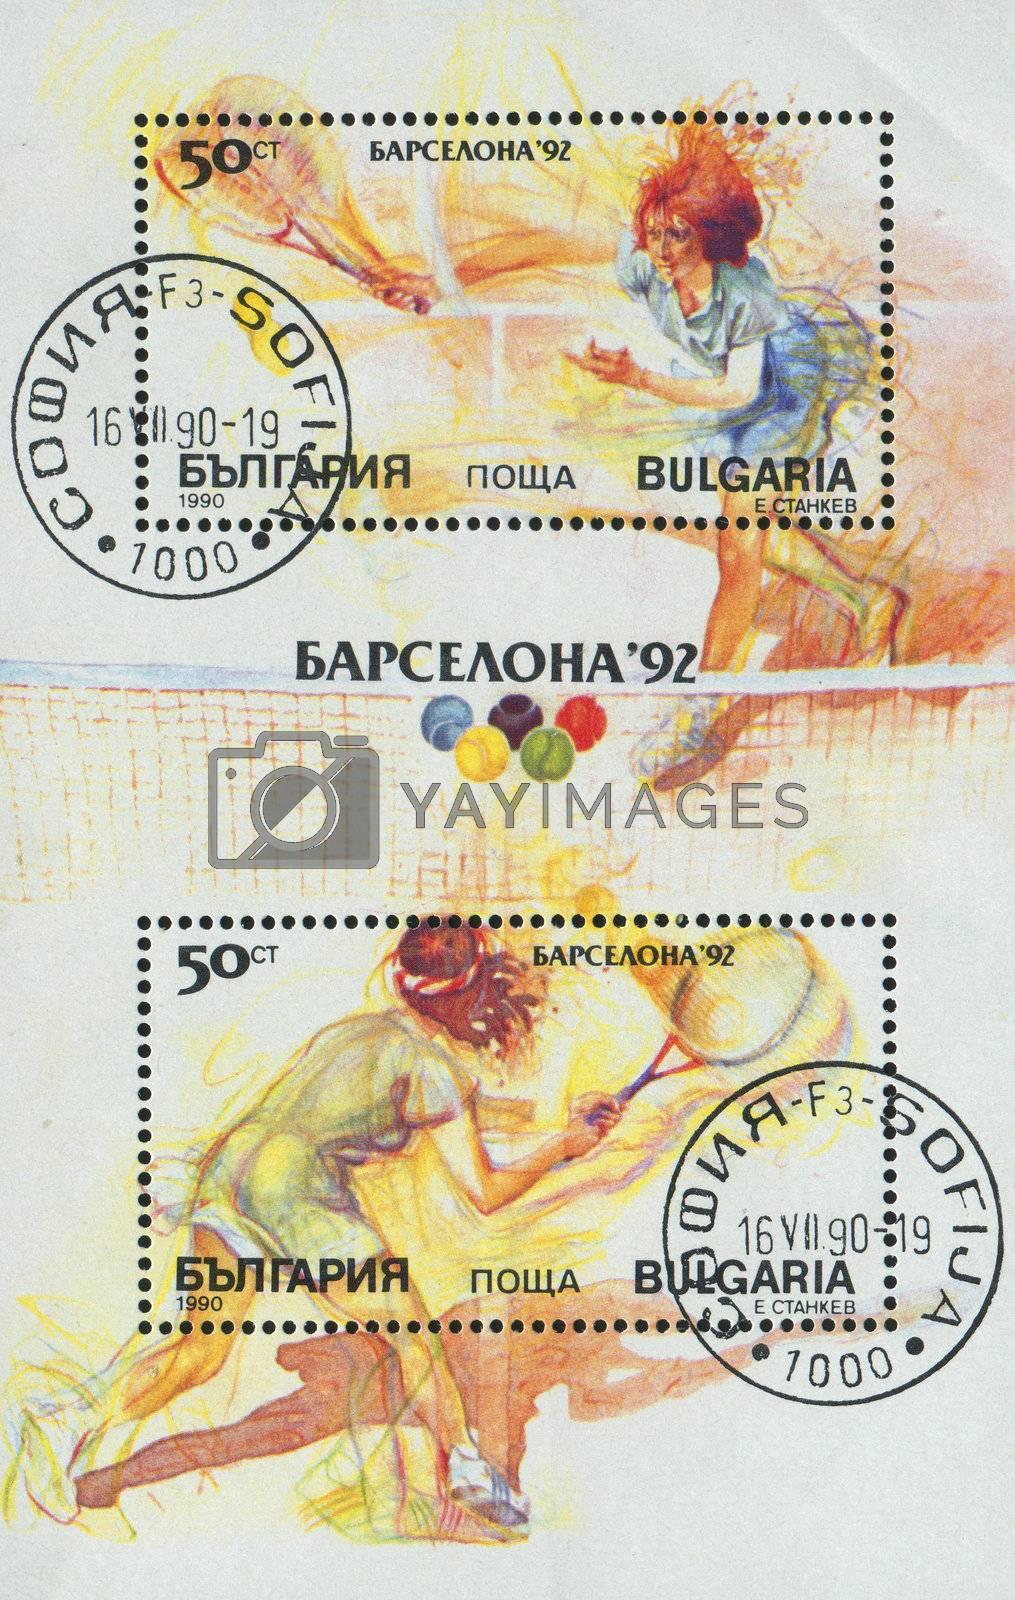 BULGARIA - CIRCA 1990: stamp printed by Bulgaria, shows lawn tennis, circa 1990.